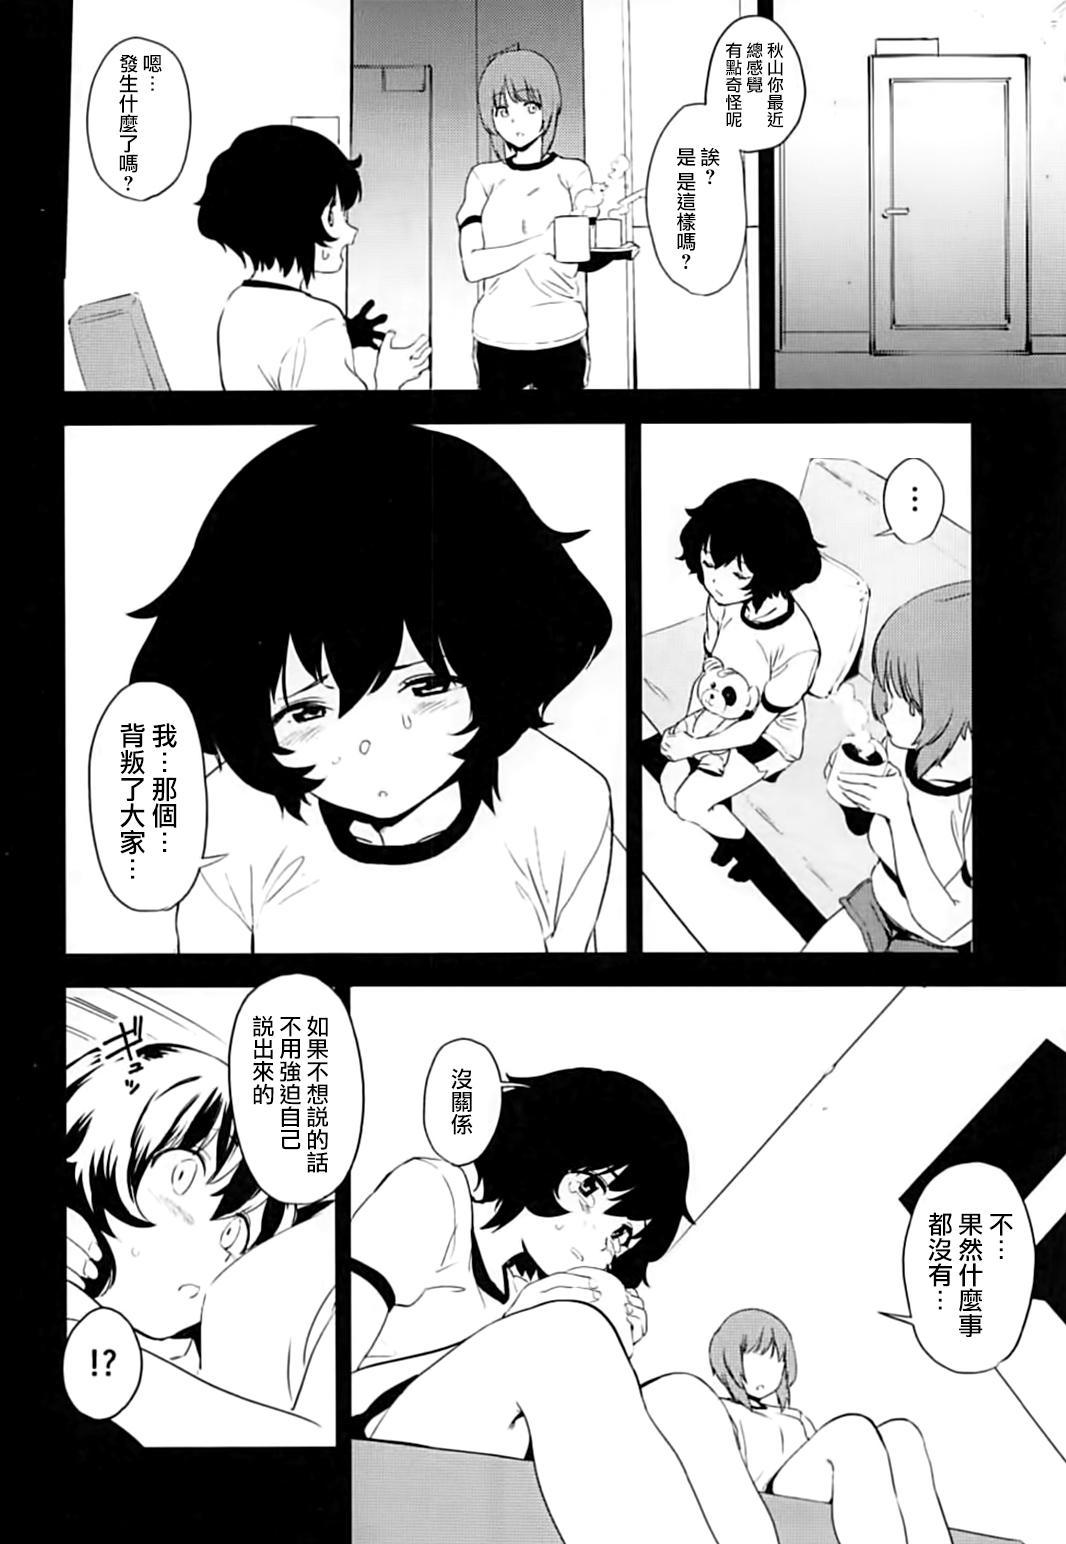 (Panzer Vor! 13) [Camrism (Kito Sakeru)] Private Akiyama 2 - Nishizumi-san to Issho (Girls und Panzer) [Chinese] [沒有漢化] 7